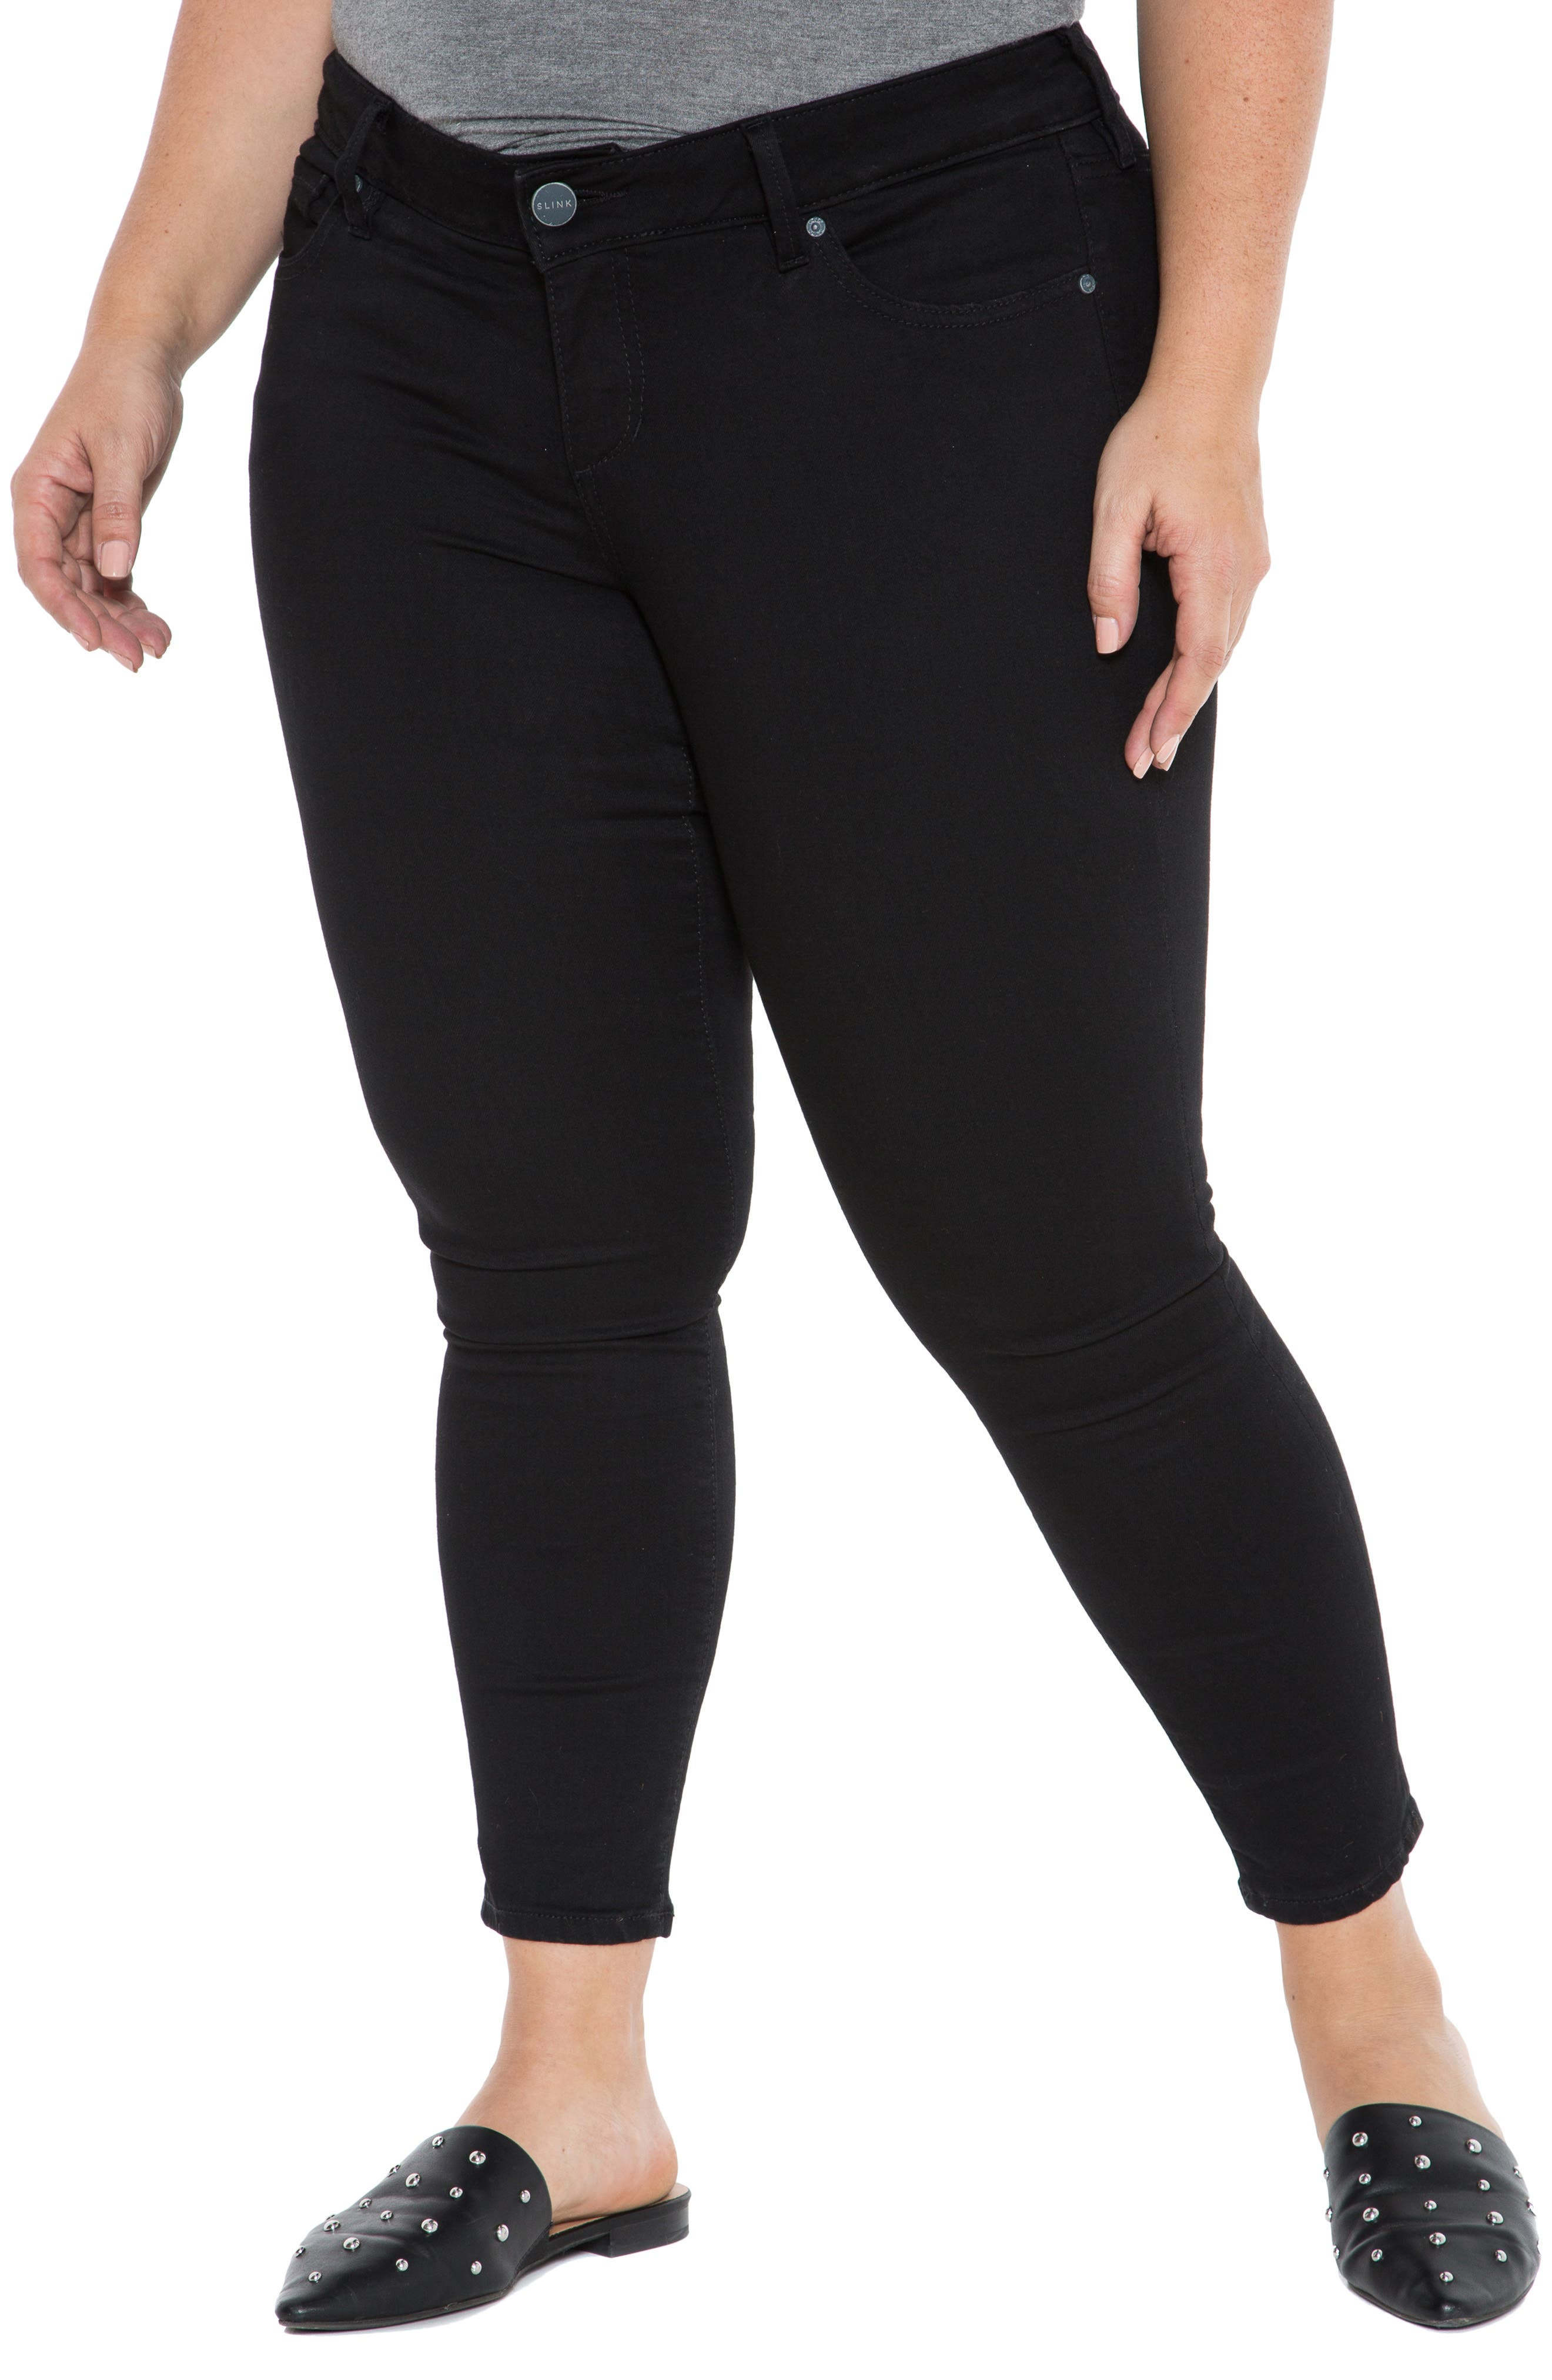 Plus Women's Slink Jeans Stretch Ankle Skinny Jeans